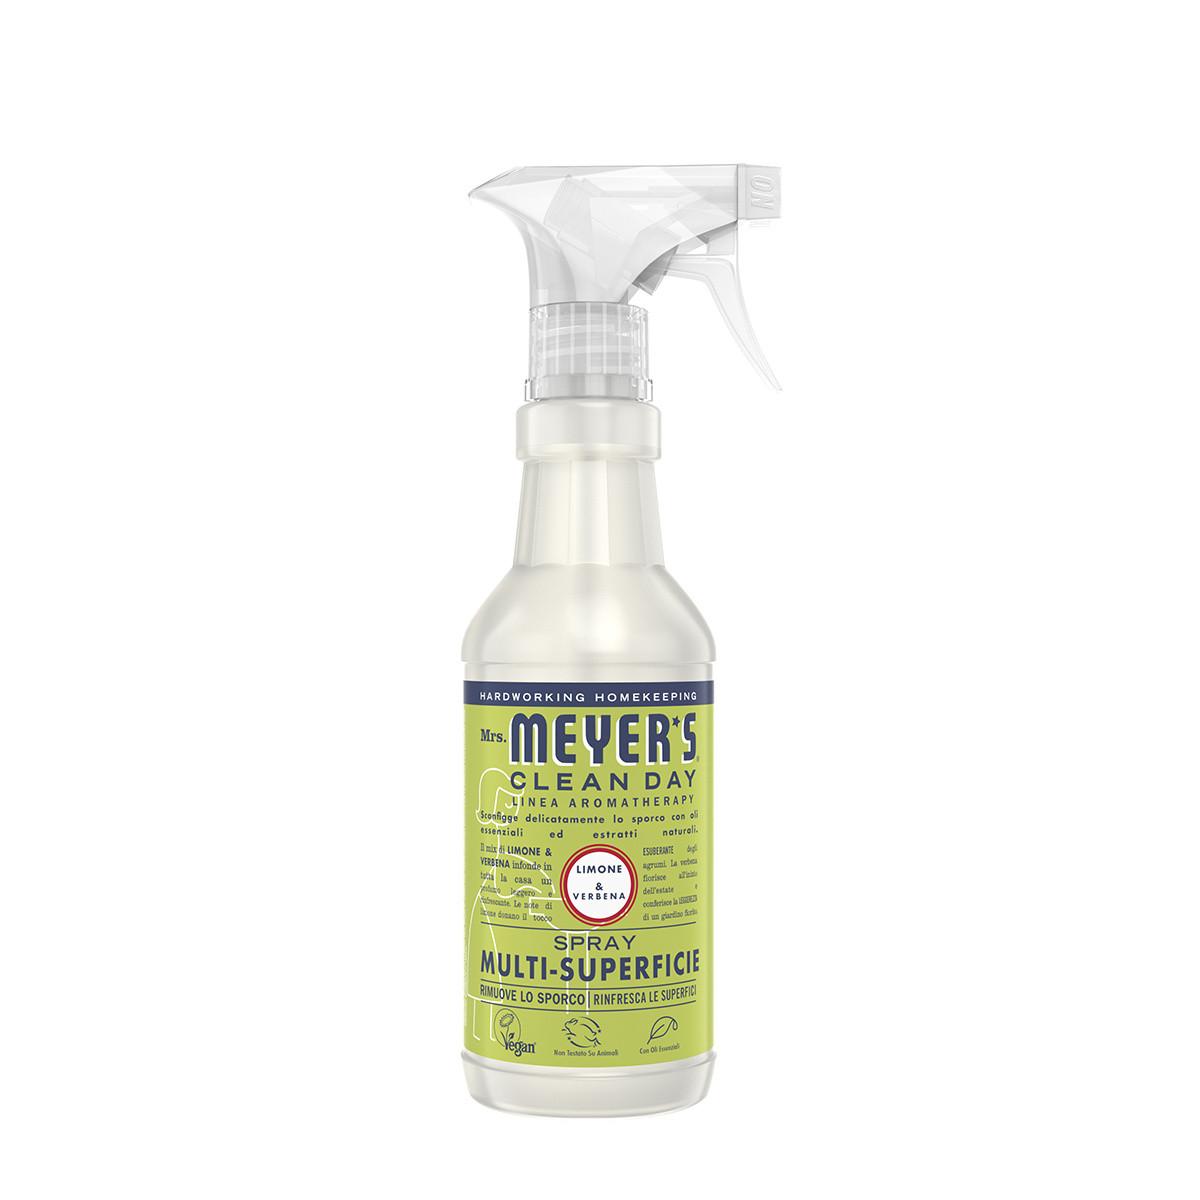 Spray detergente multi-superficie profumo di limone 473ml, Giallo scuro, large image number 0